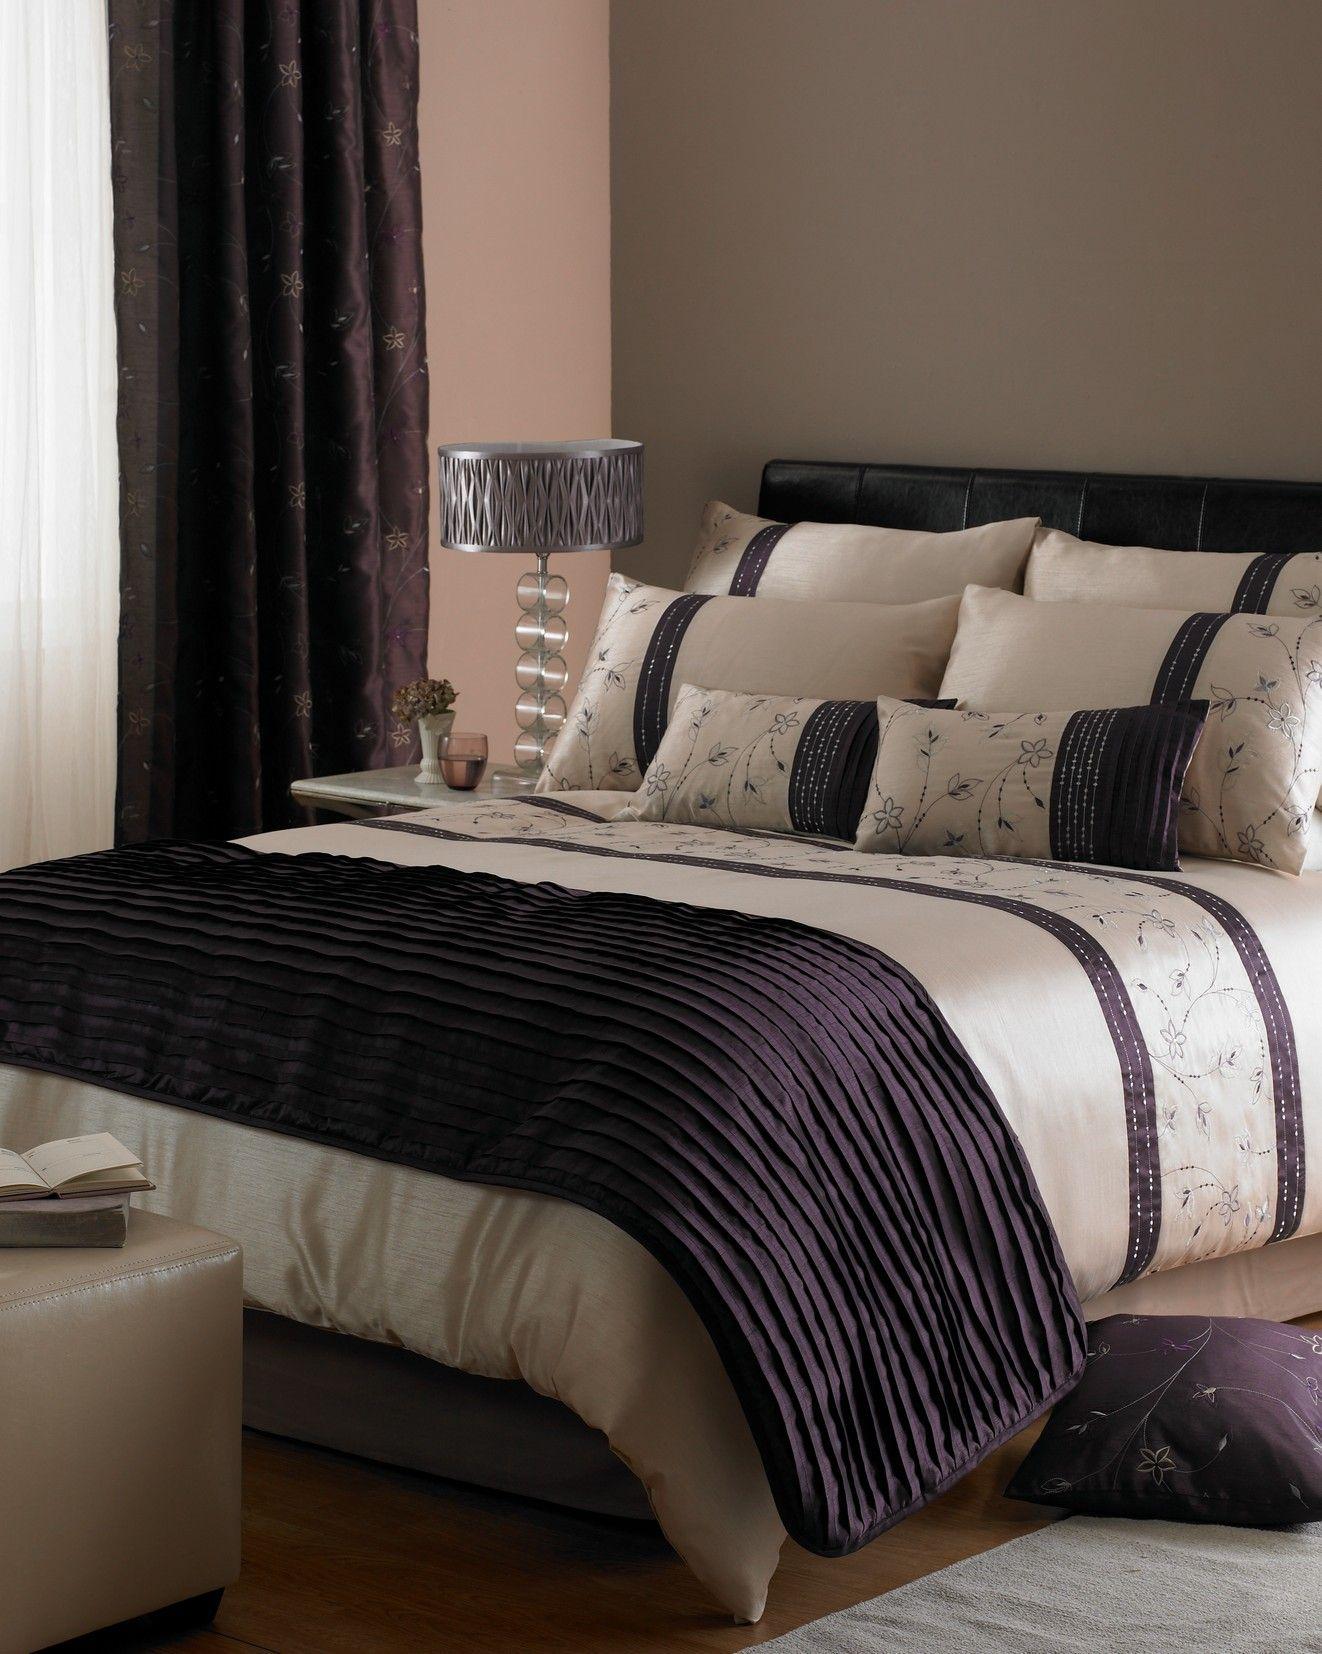 Bed Runner / Throw 95 x 25 In, Luxury bedding, Bed